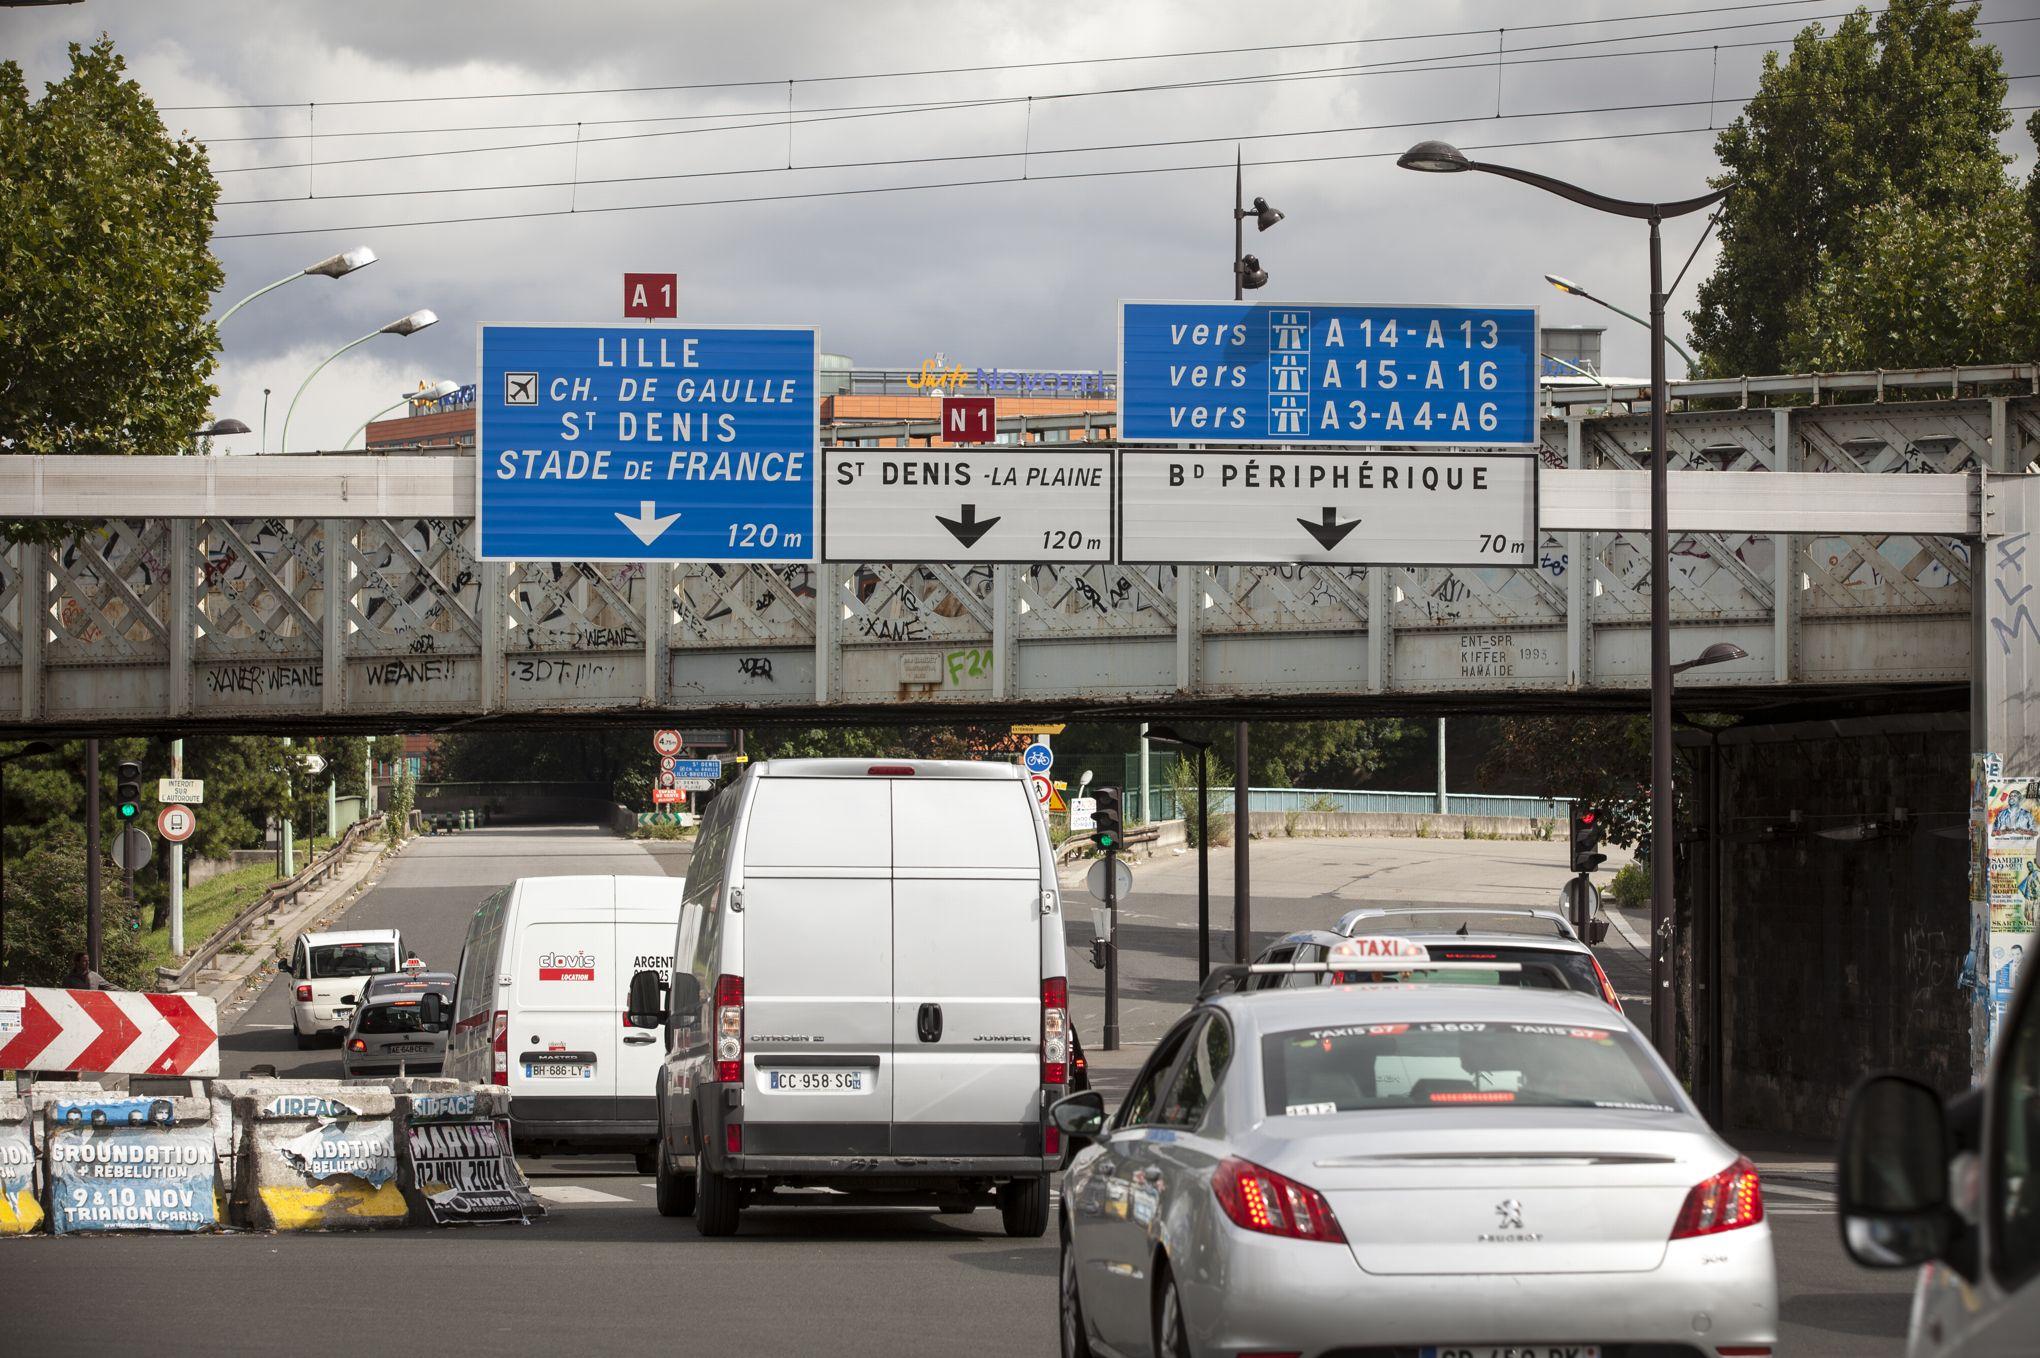 Rencontre autoroute a10